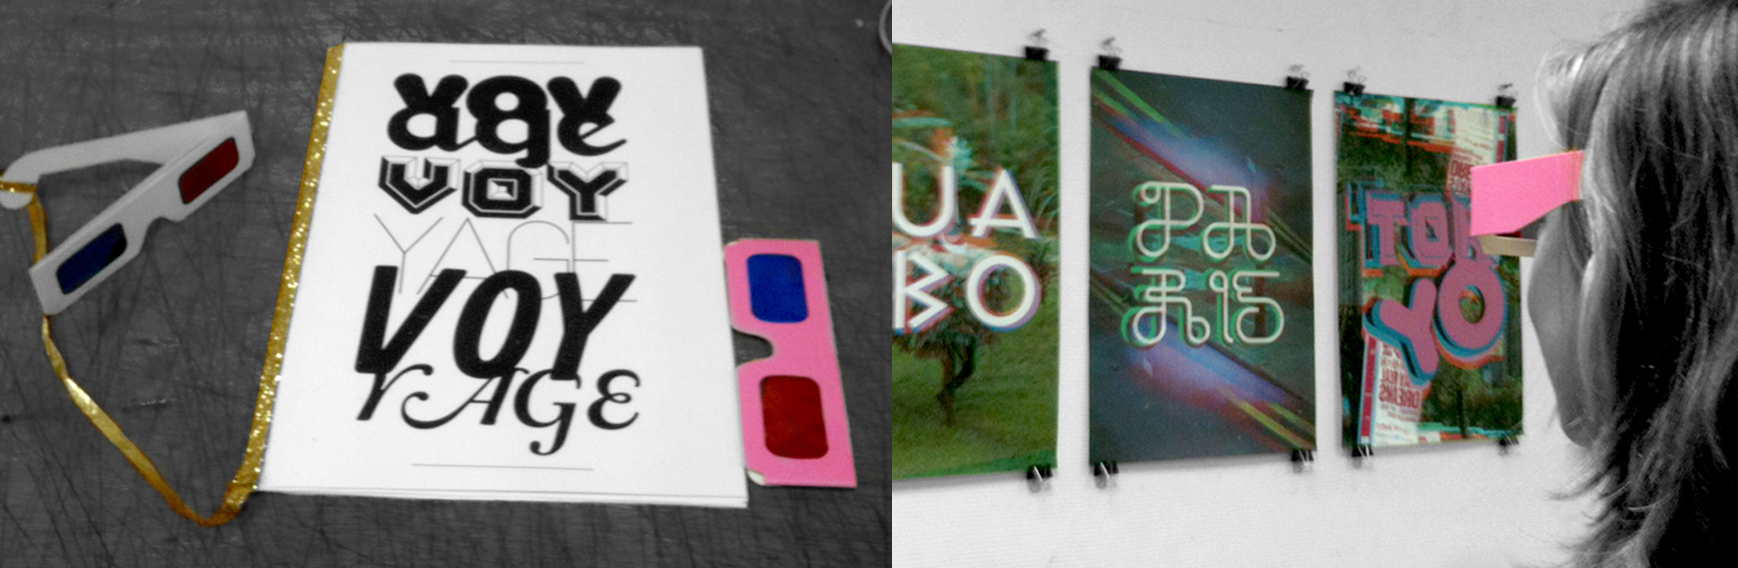 alix+neyvoz+3D+poster+type+voyage+11.jpg